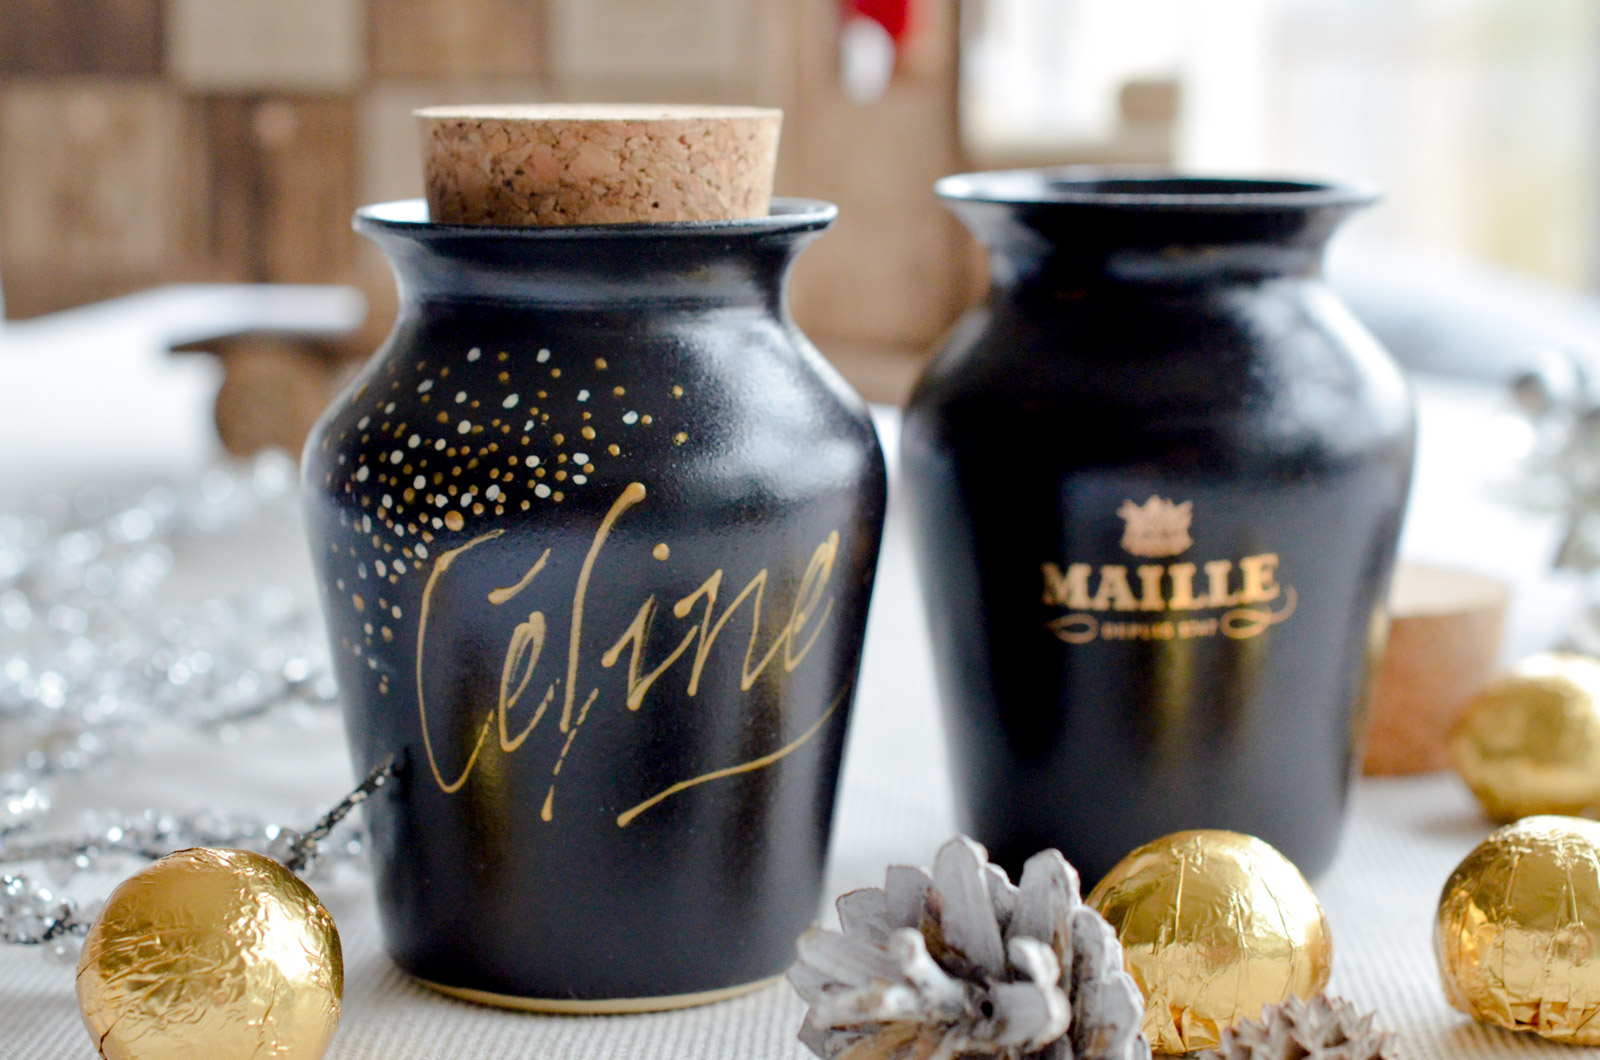 Maille Noel 2016 Calligraphie 1 Sur 2